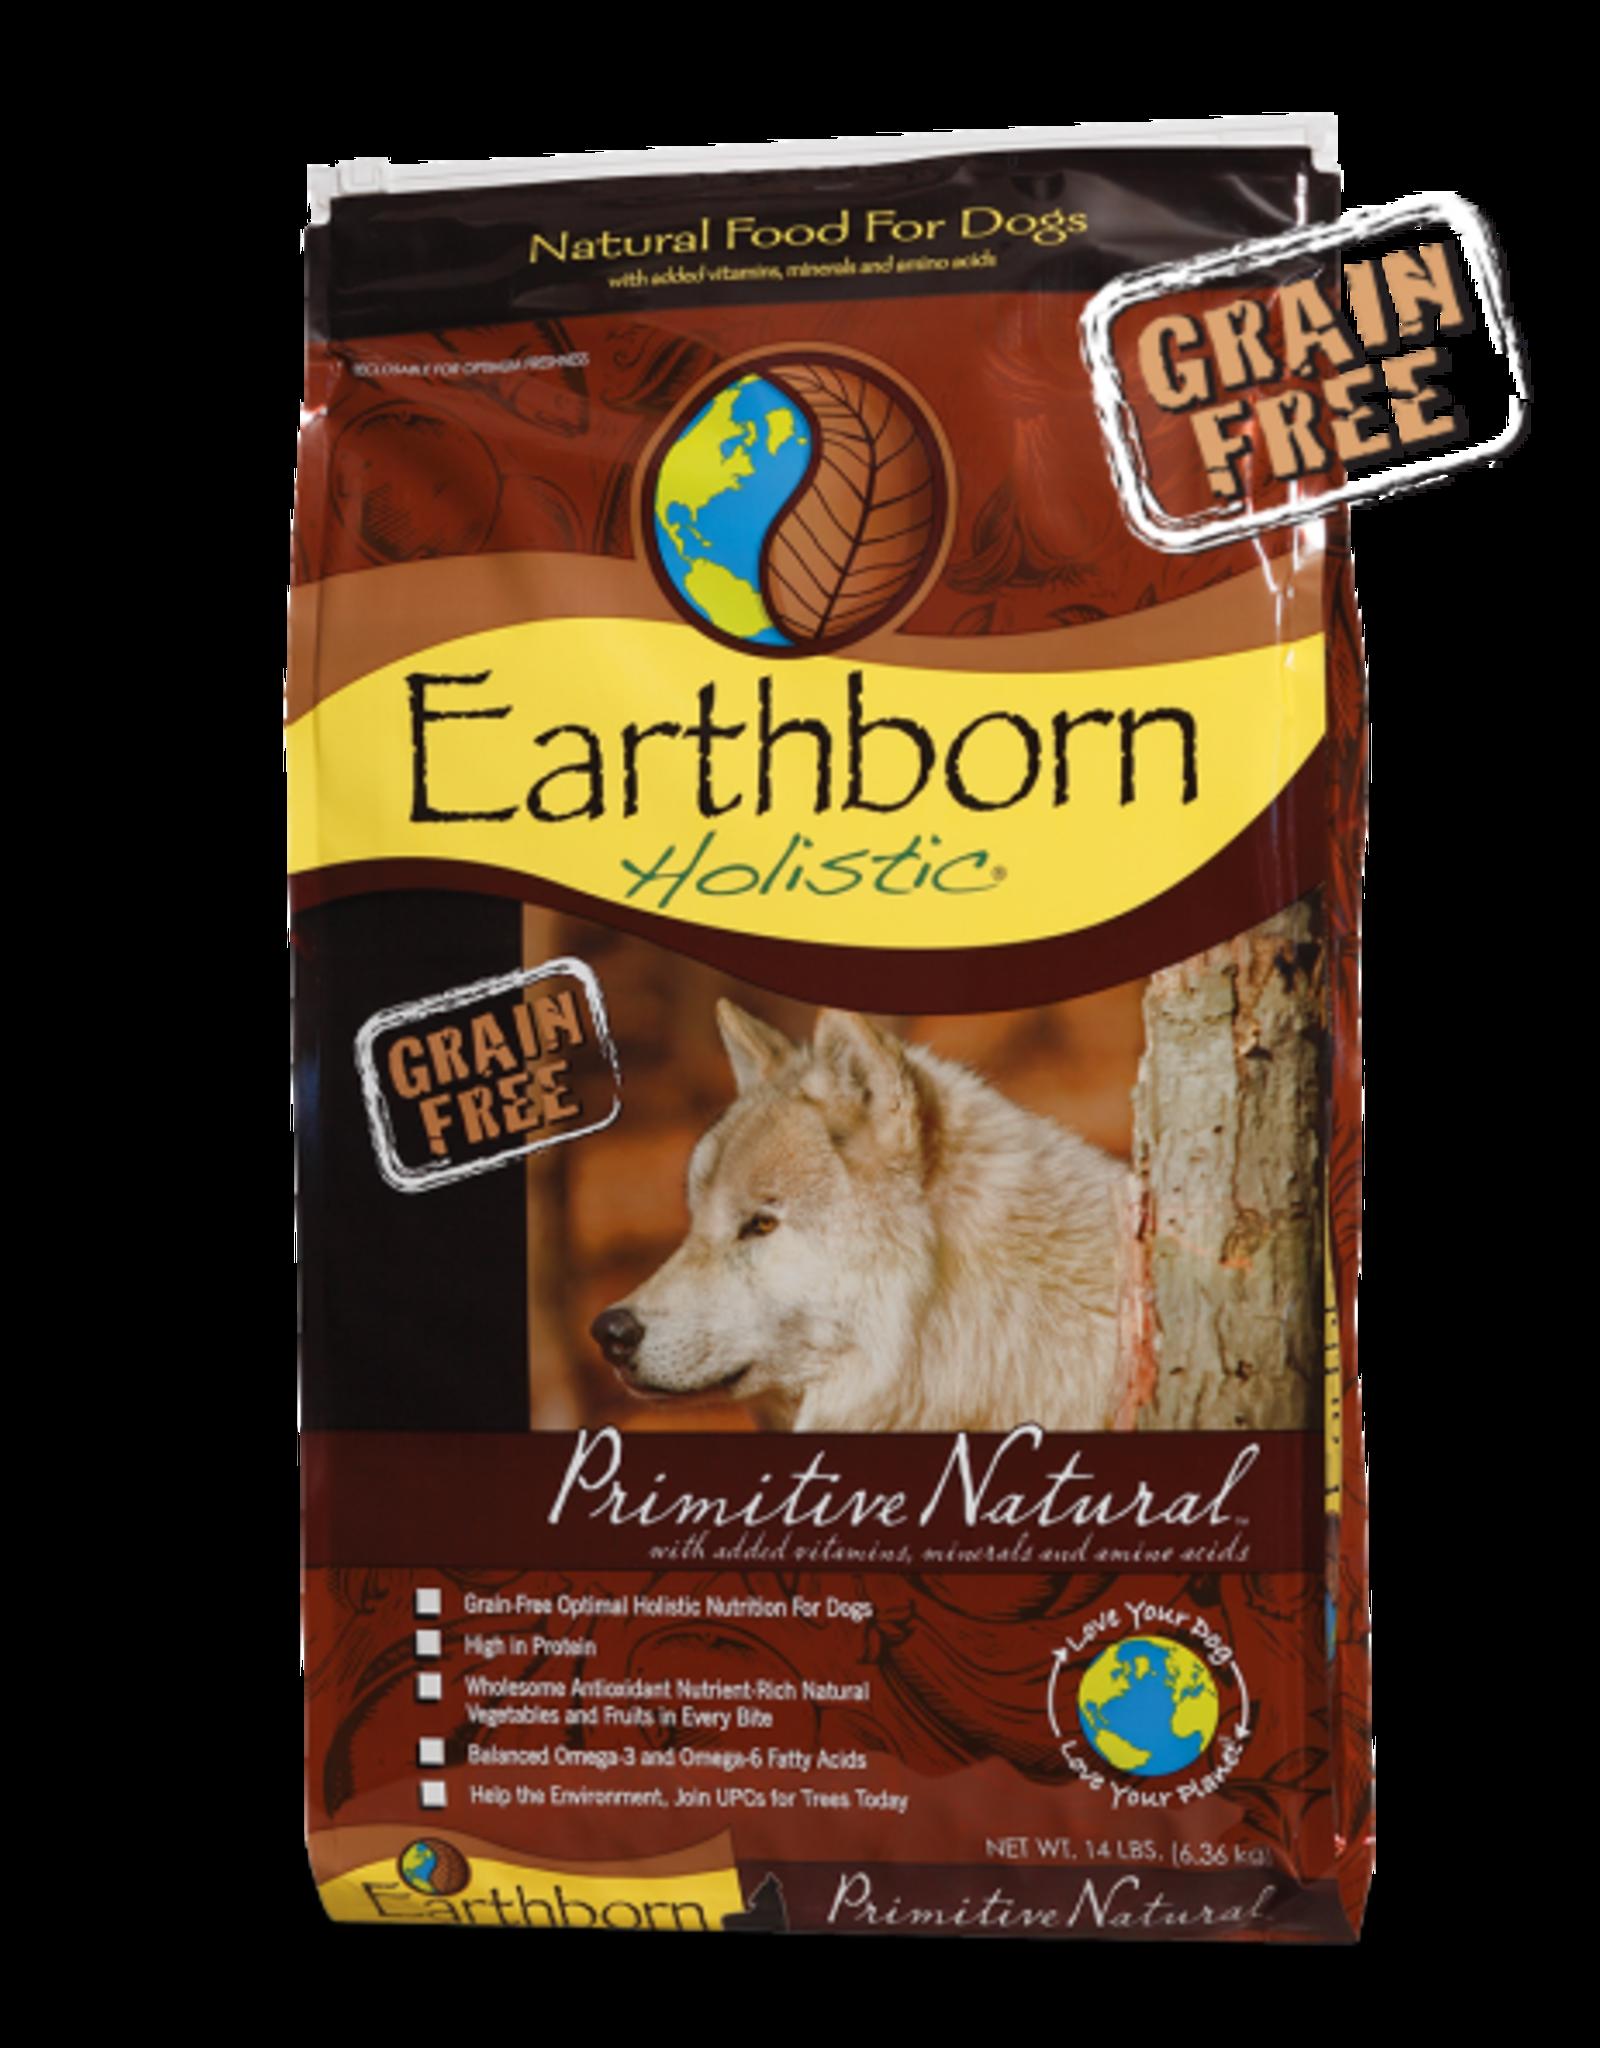 EARTHBORN EARTHBORN HOLISTIC DOG PRIMITIVE NATURAL 28LBS